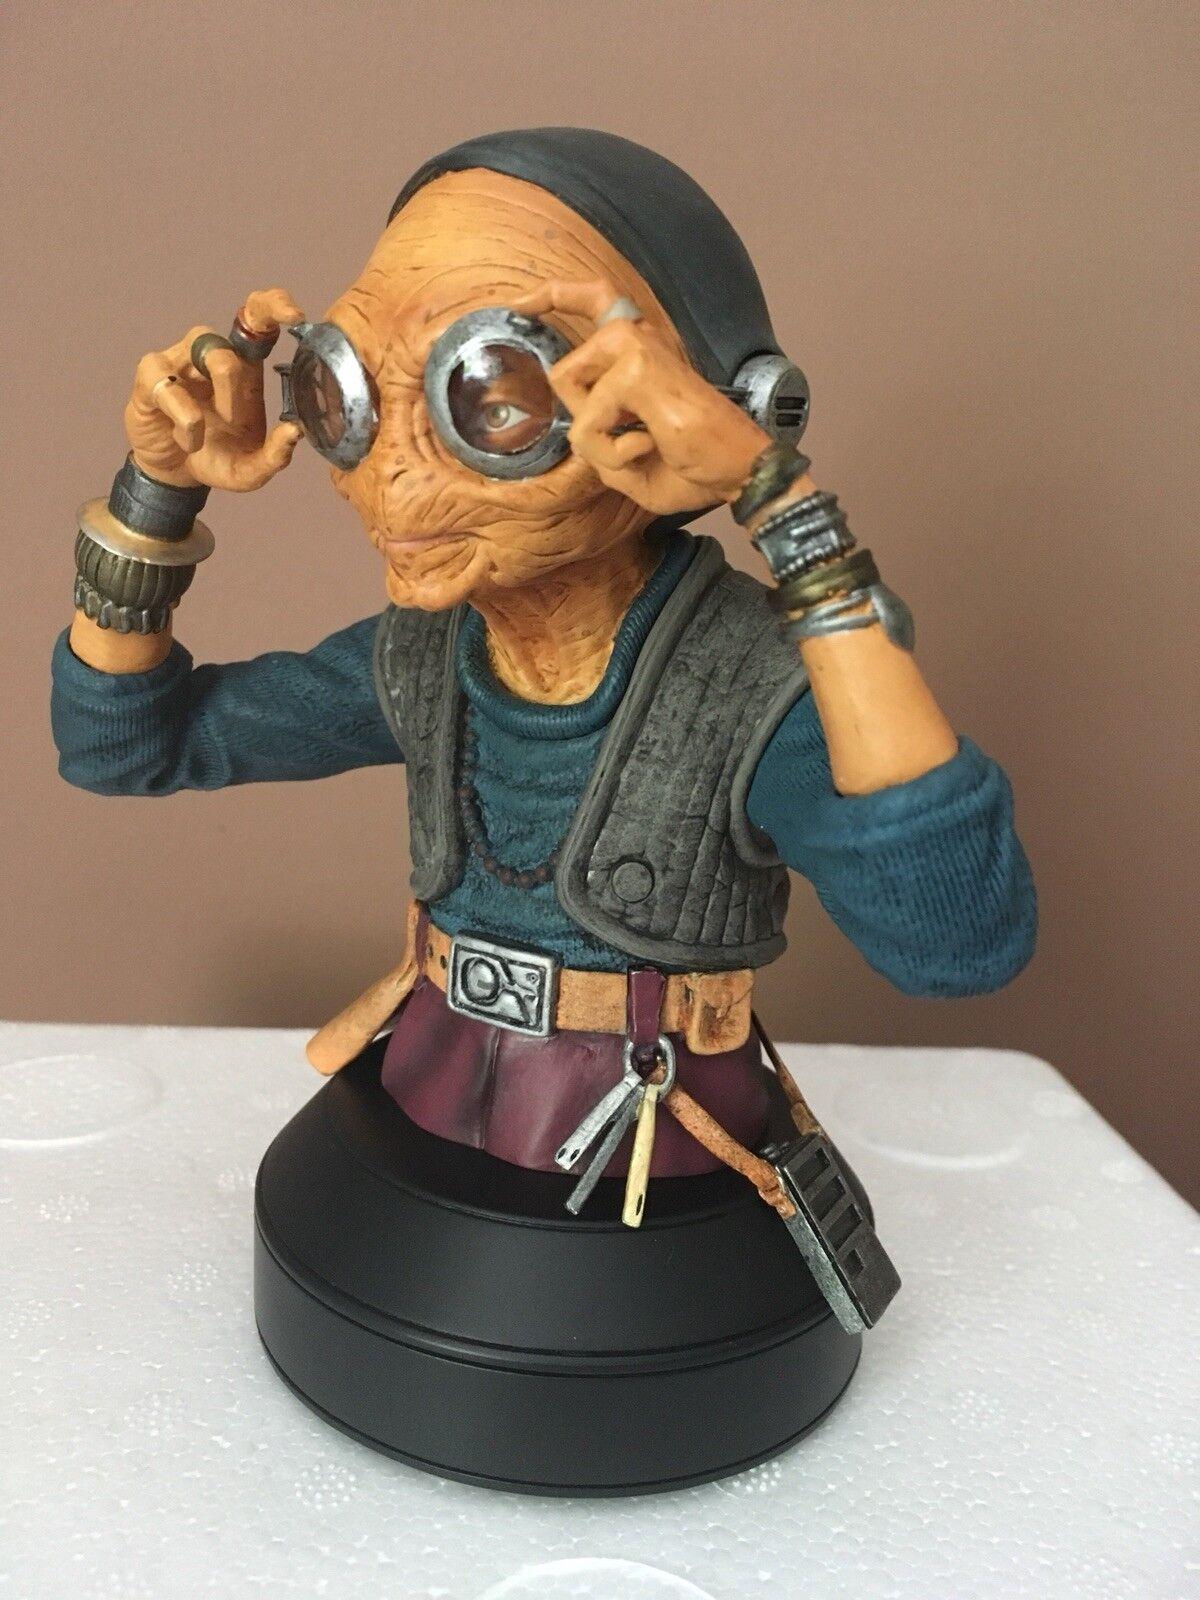 Star Wars Gentle Star Wars The Force Awakens Maz Kanata Bust